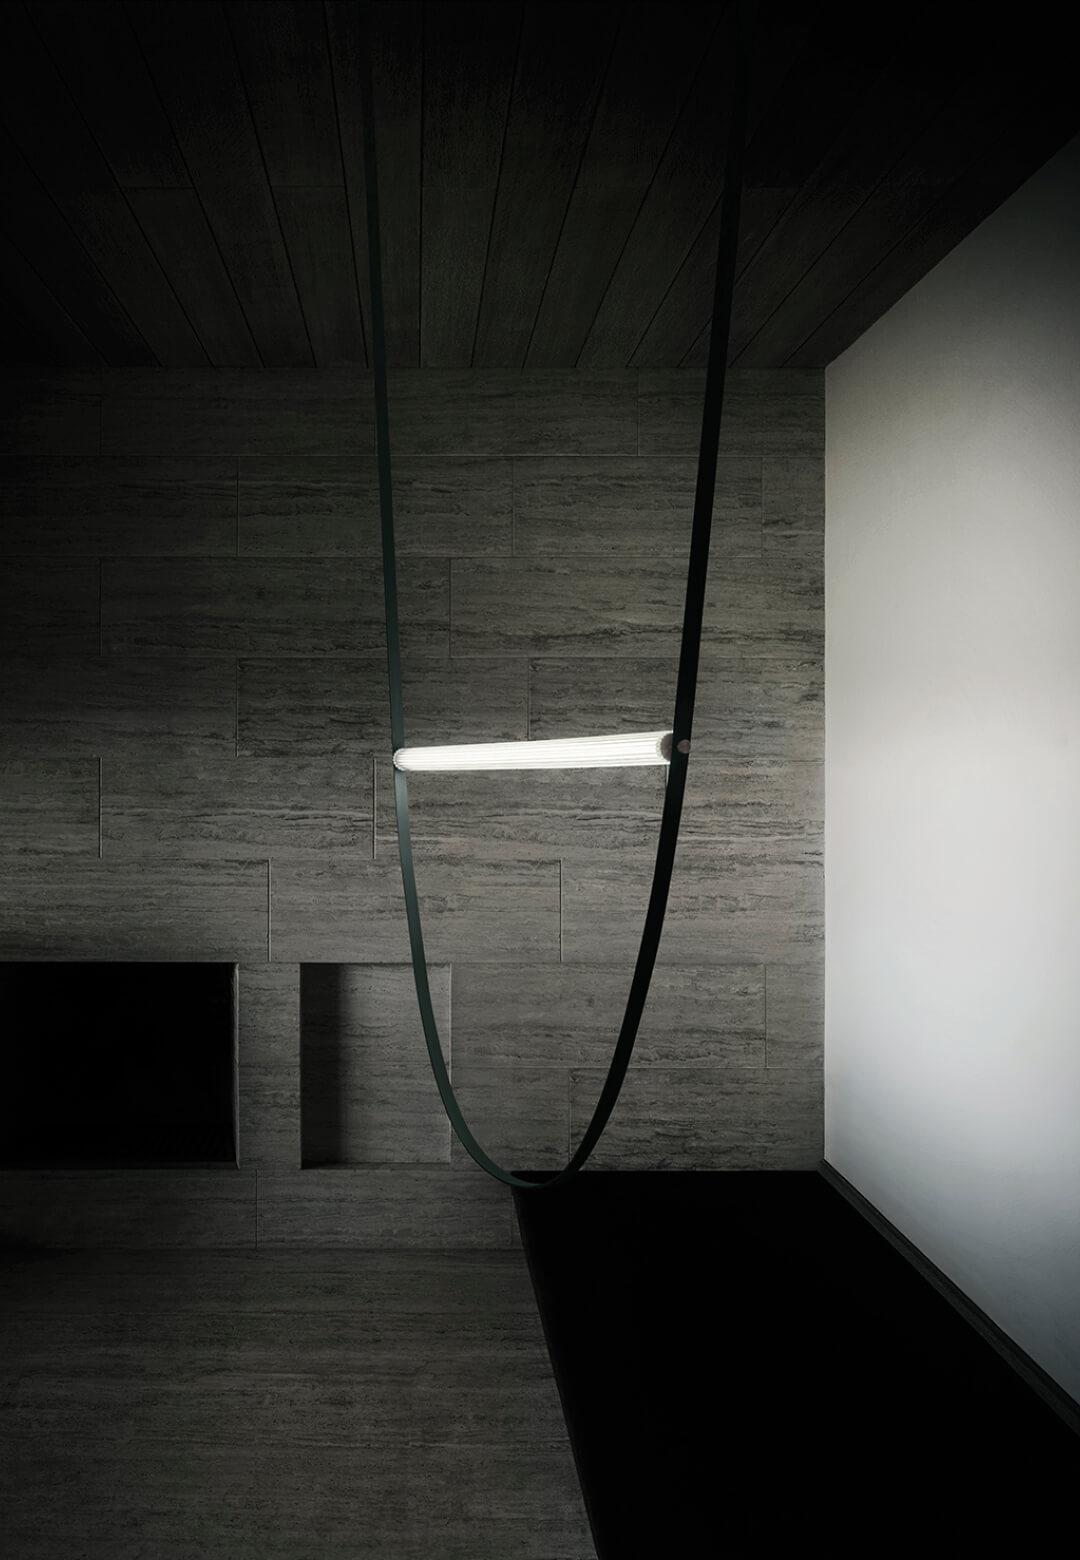 WireLine for Flos designed by Studio Formafantasma | WireLine by Formafantasma | STIRworld